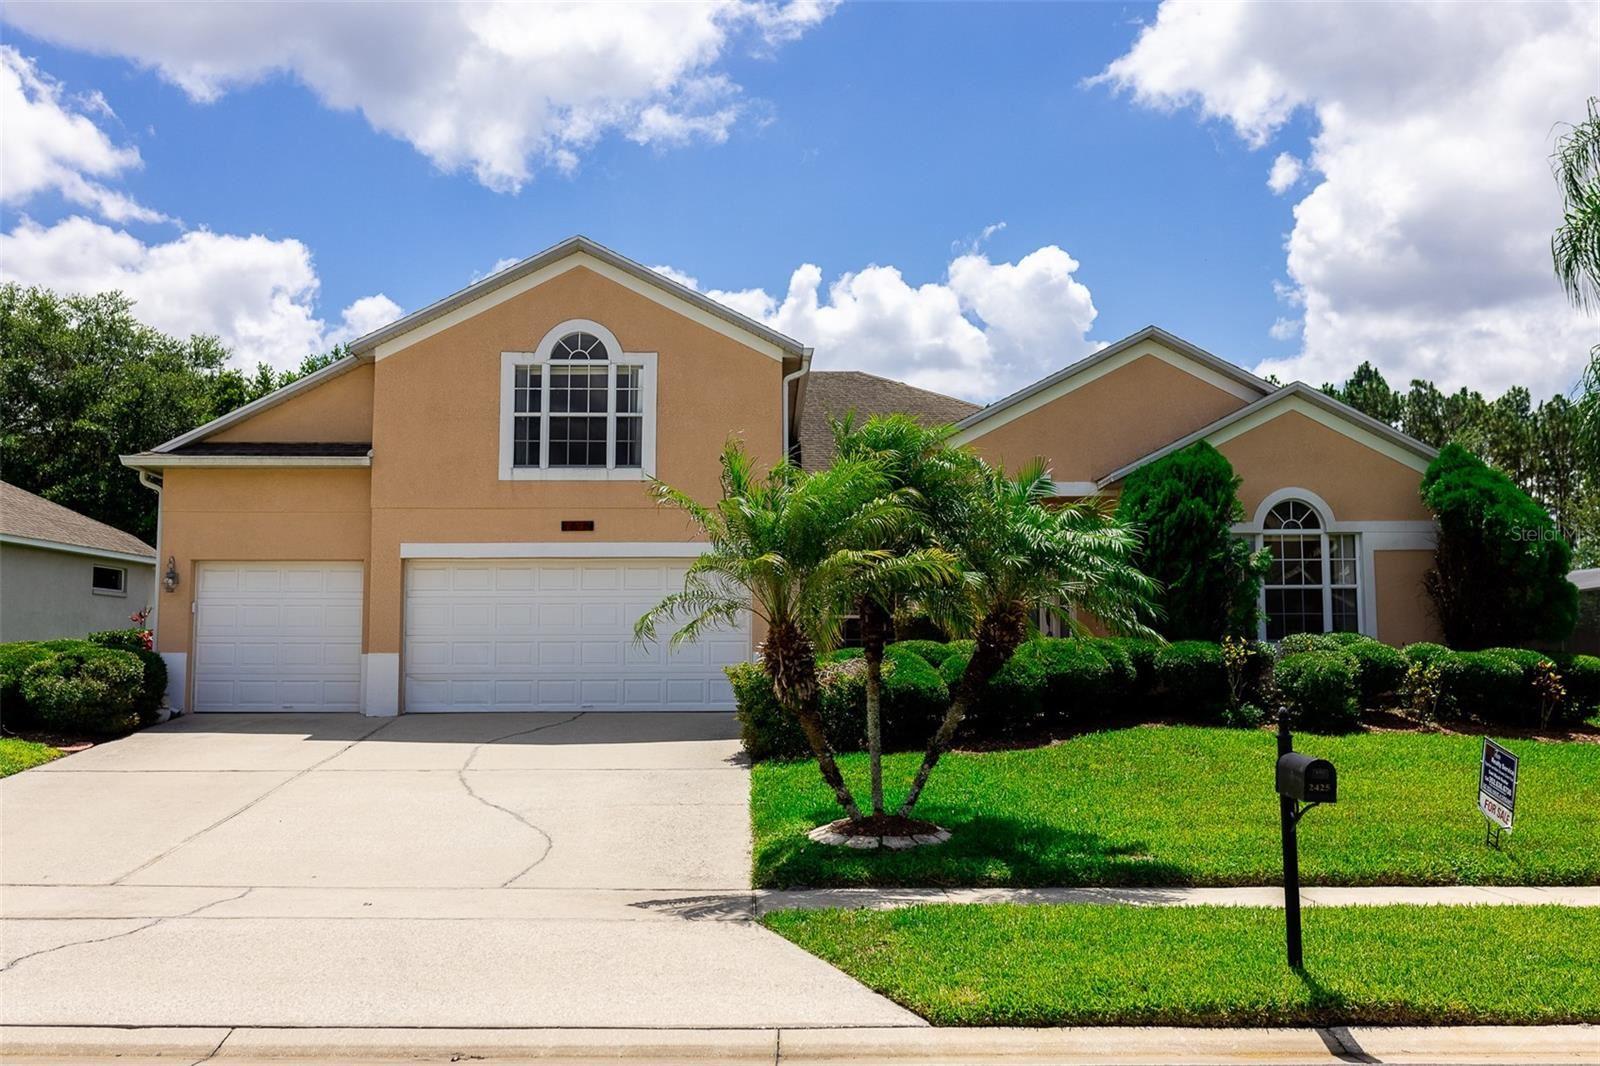 2425 PRAIRIE VIEW DRIVE, Winter Garden, FL 34787 - #: O5940966